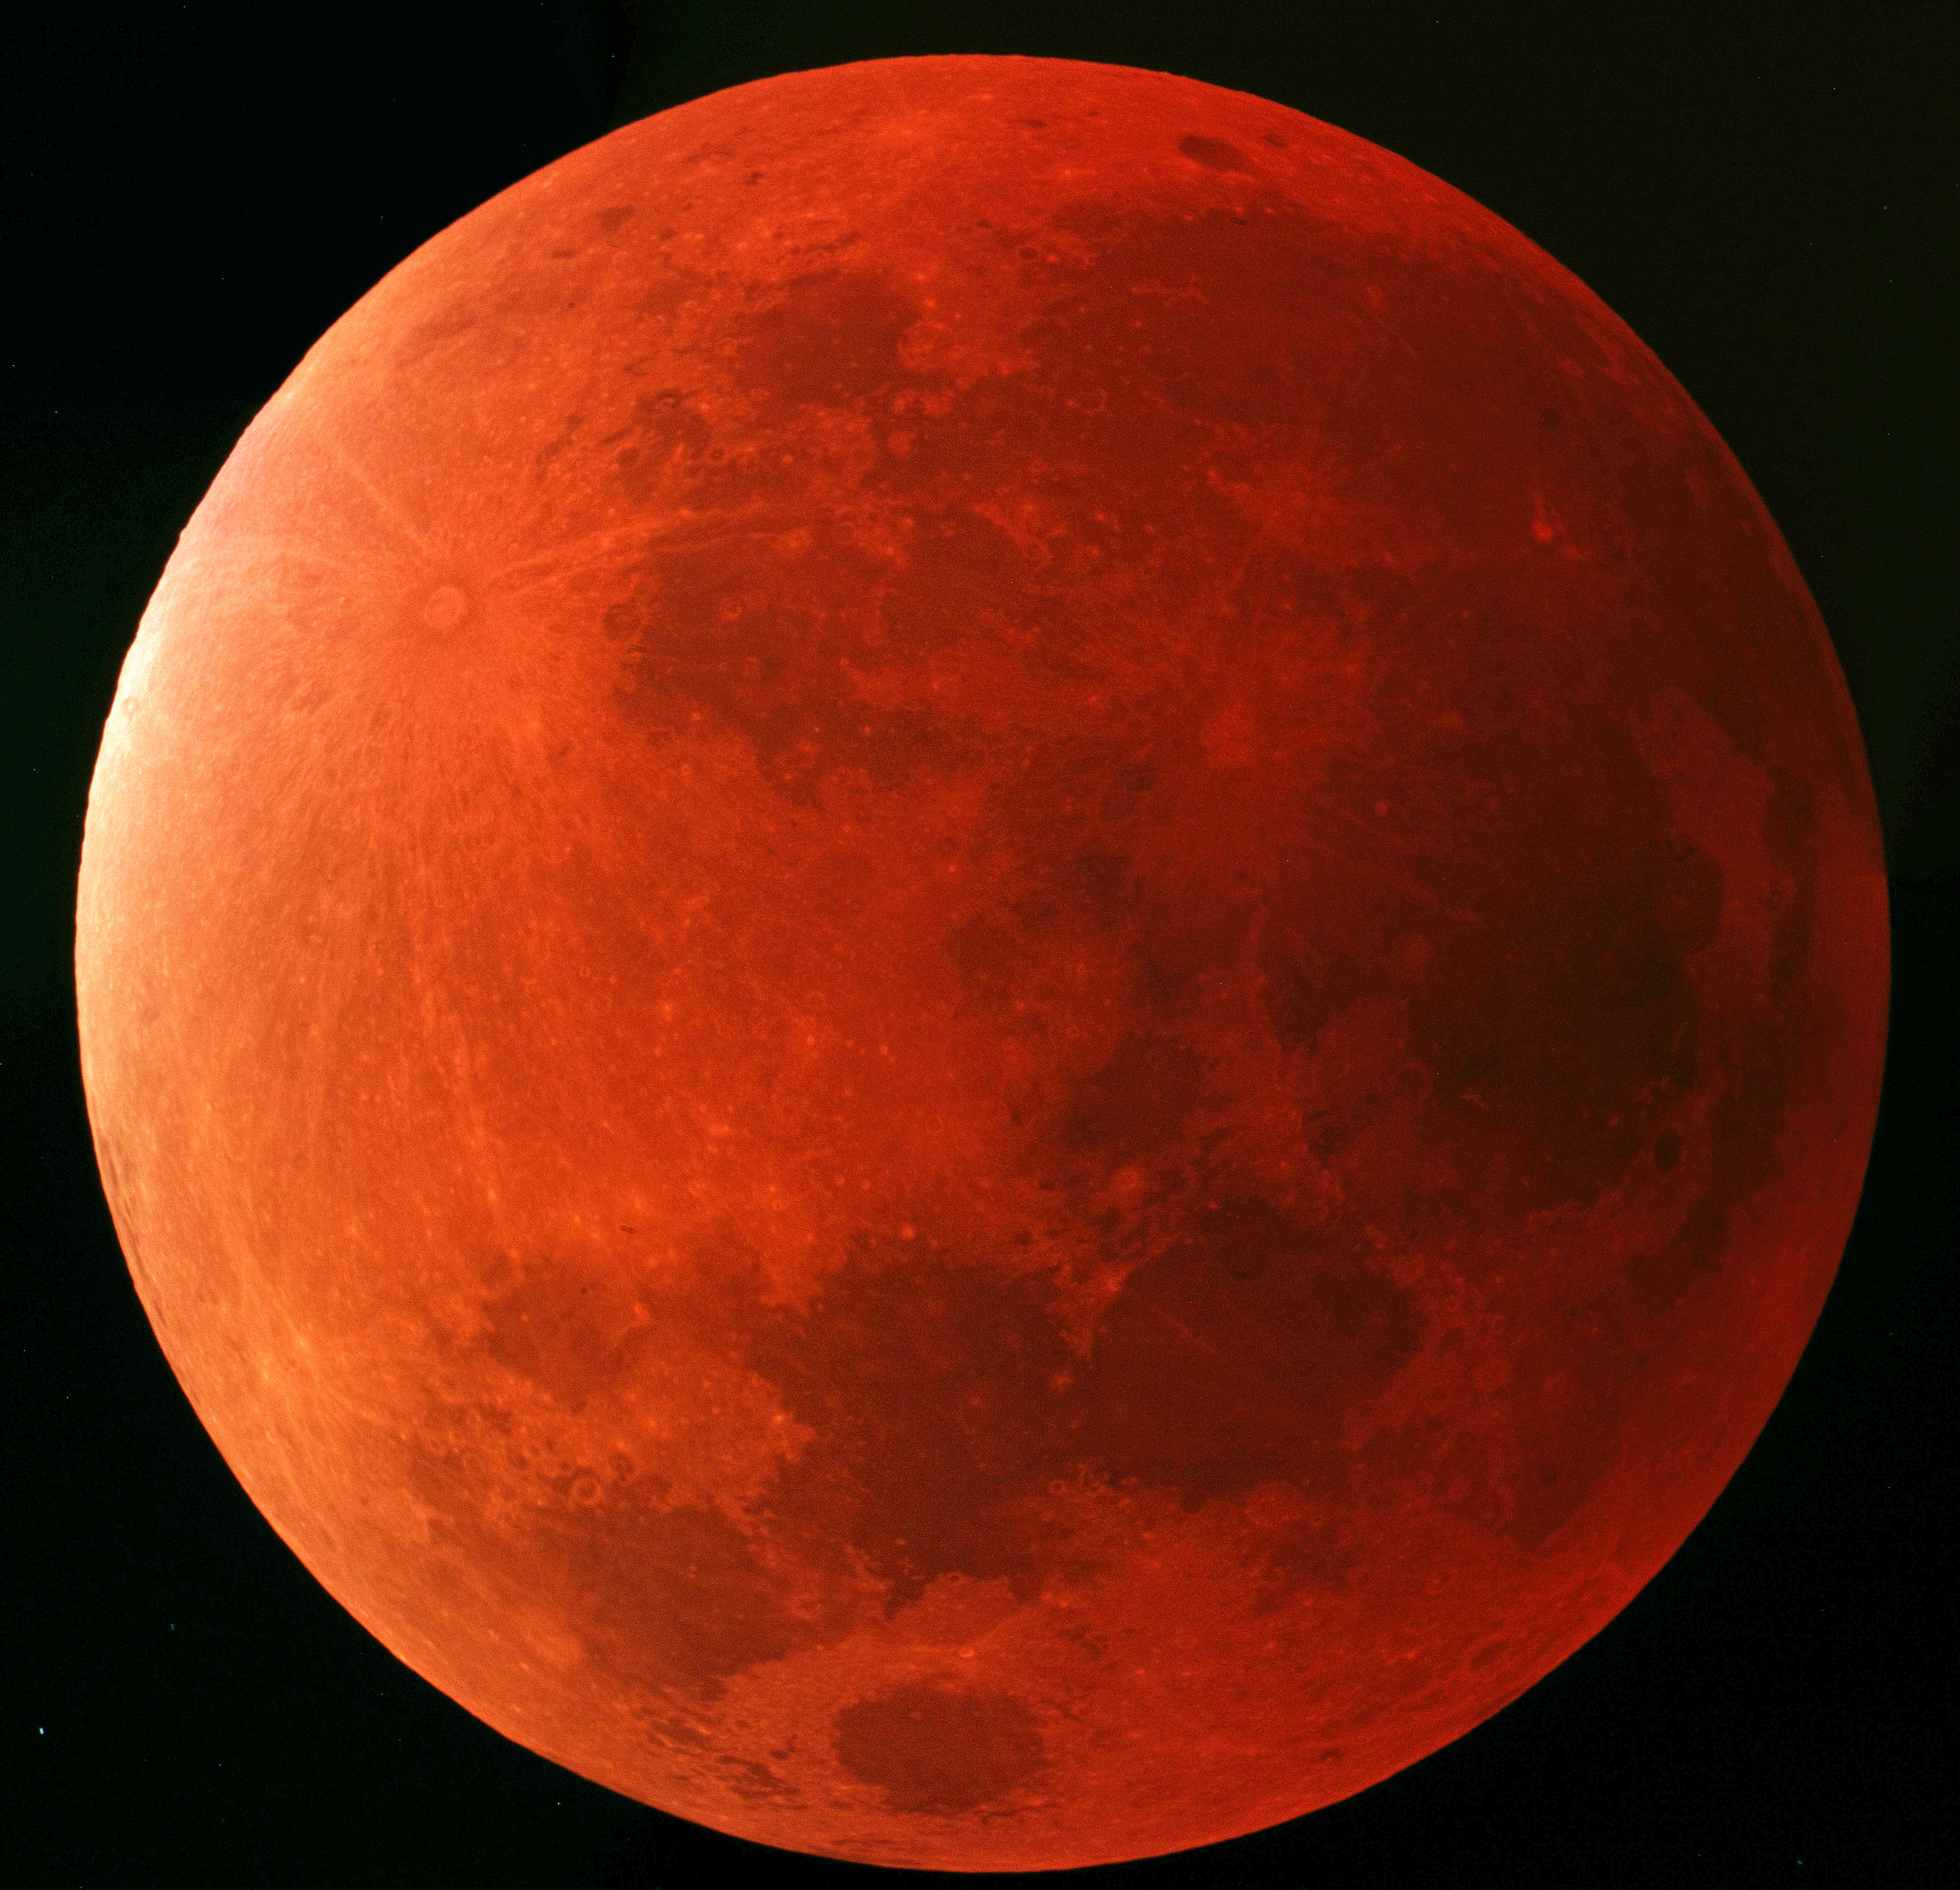 luna-eclipse-mosaico iso800-3seg-28-0915-j-Martínez